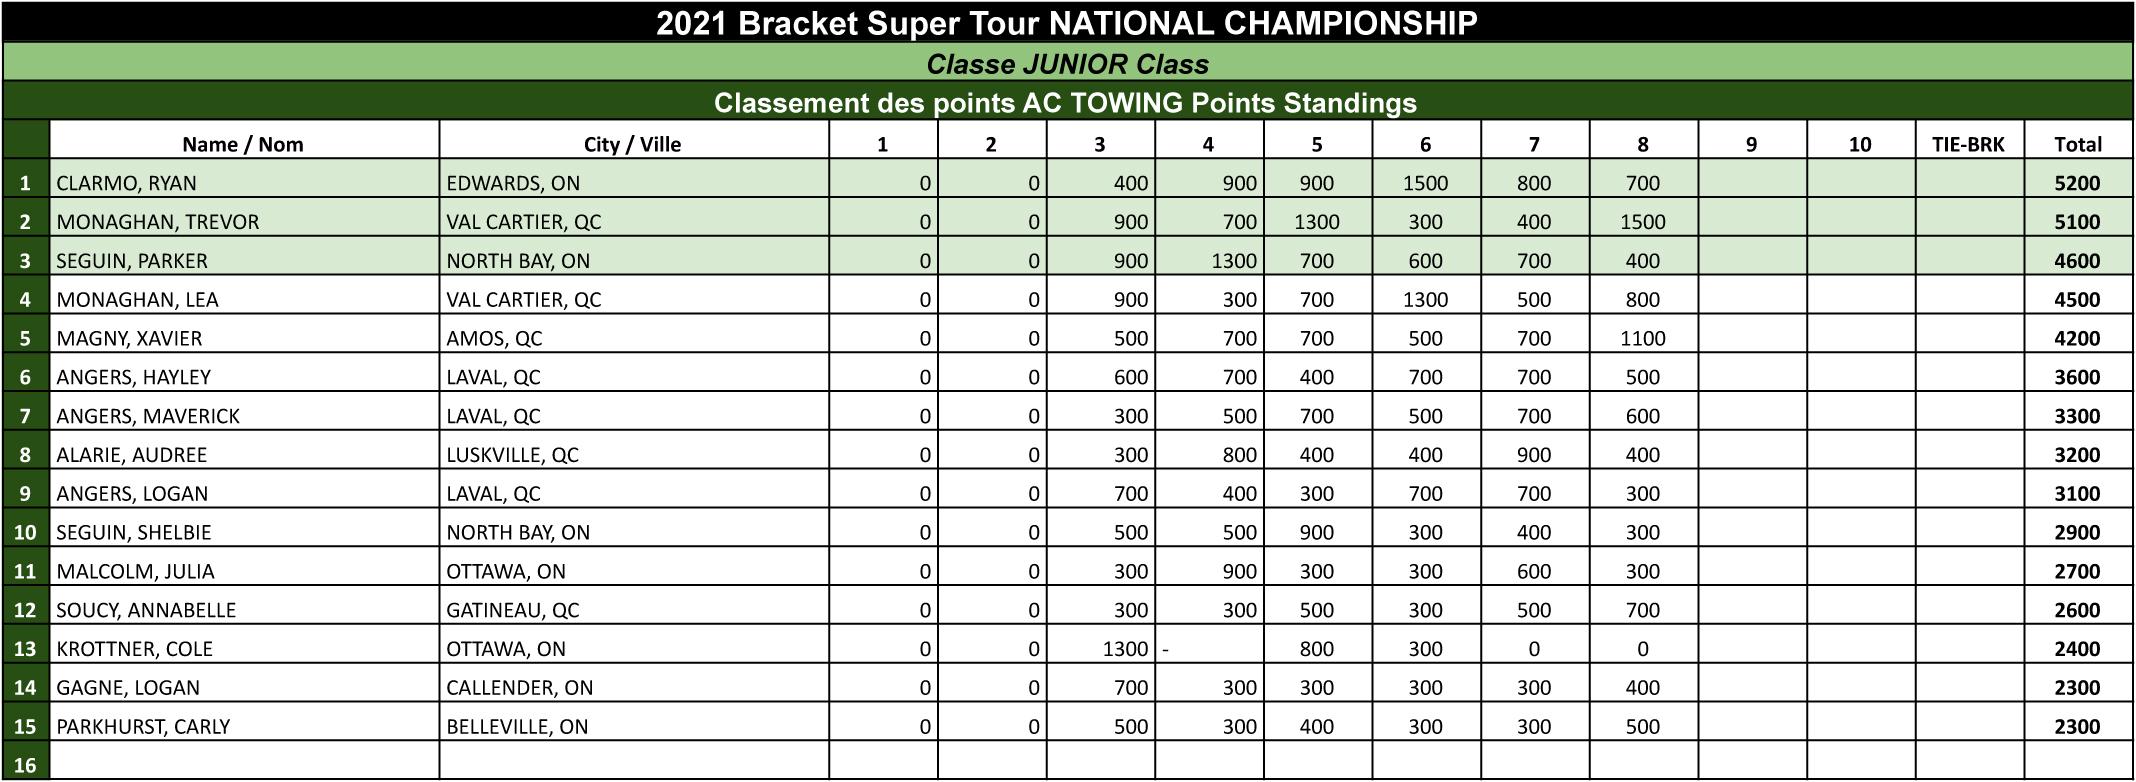 Bracket Super Tour - 2021 Junior Points Standings